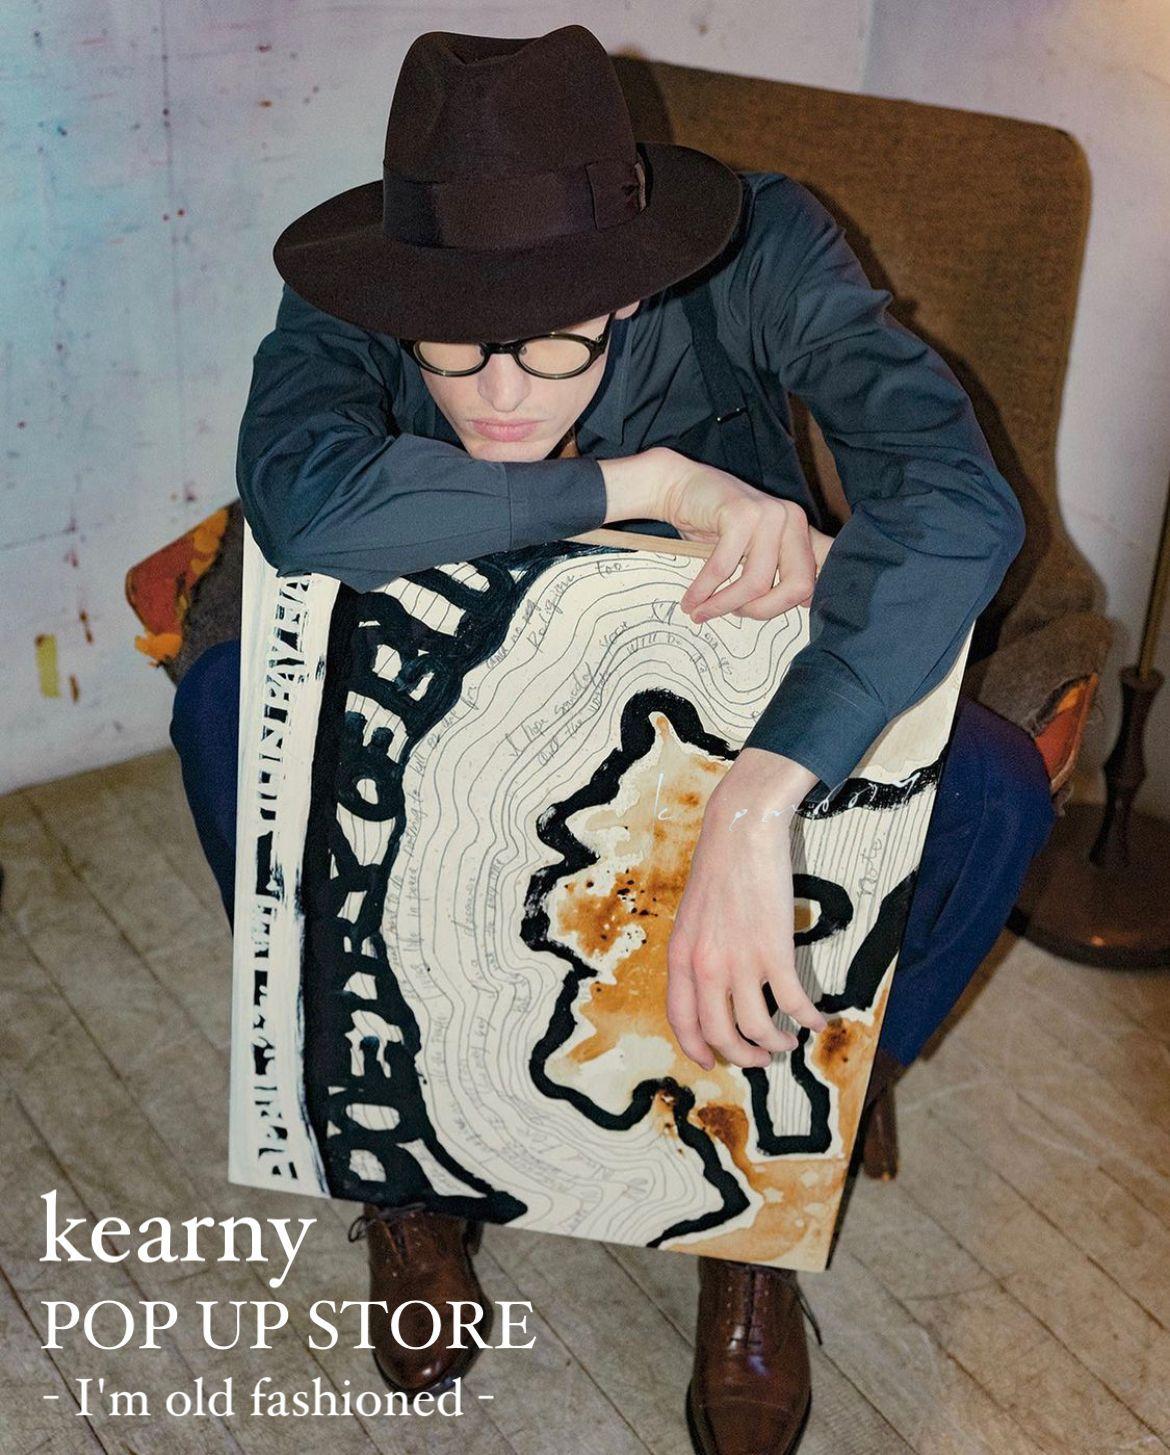 kearny POP UP STORE - I'm old fashioned - 8/7-10の写真